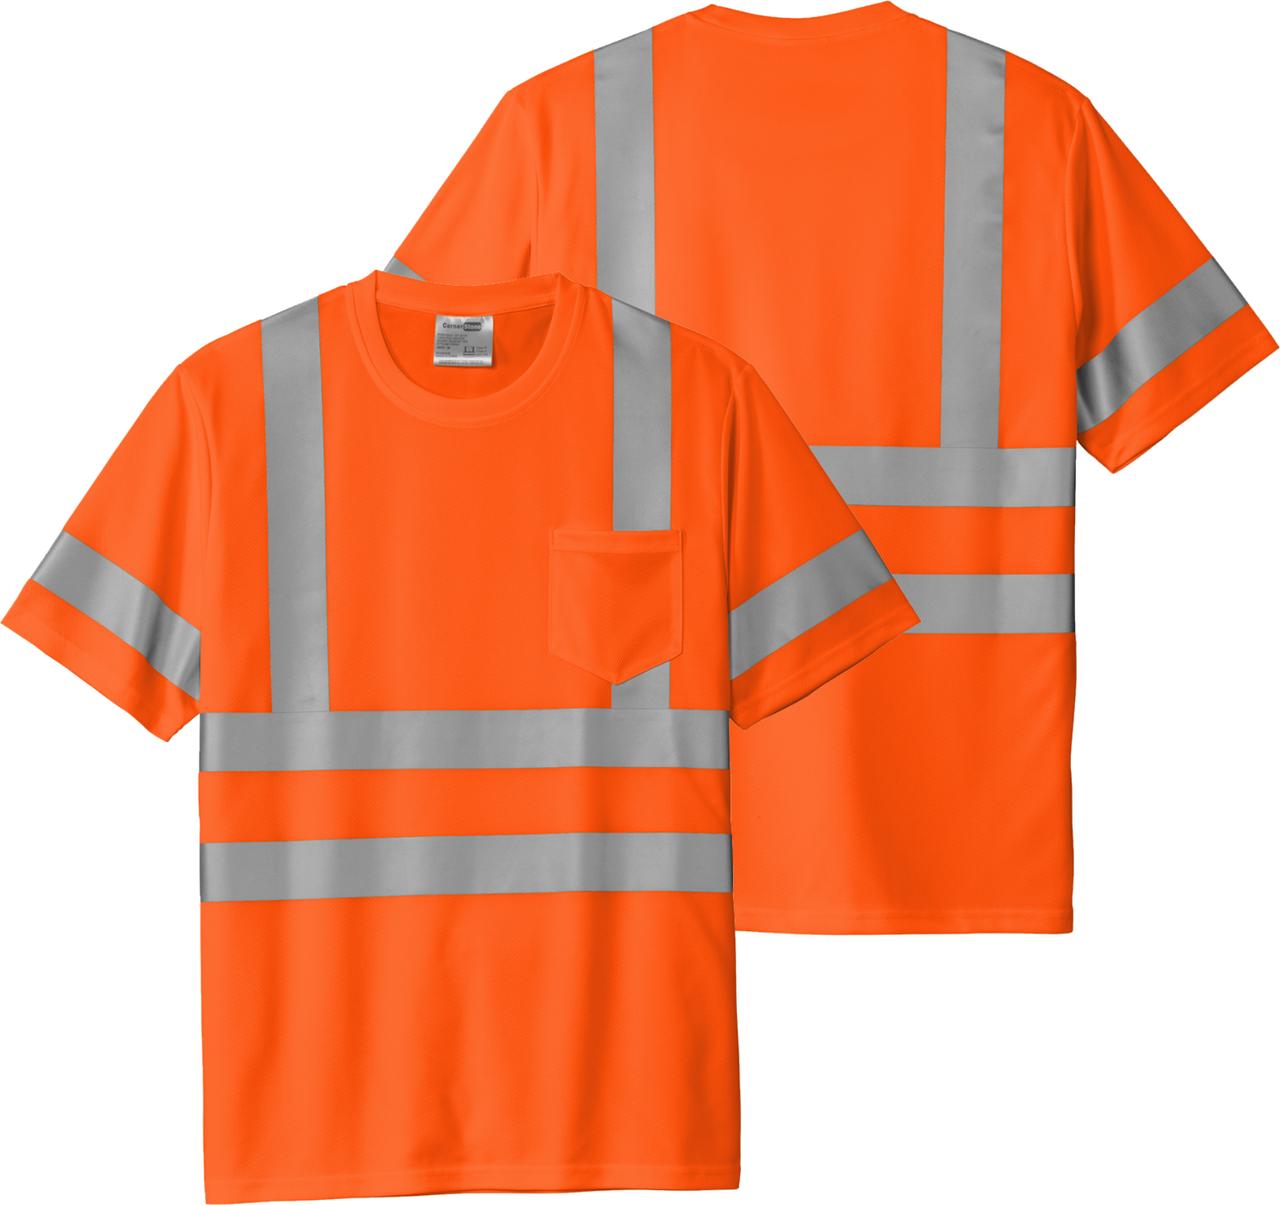 Safety Orange Class 3 Reflective Tshirt 100% Polyester